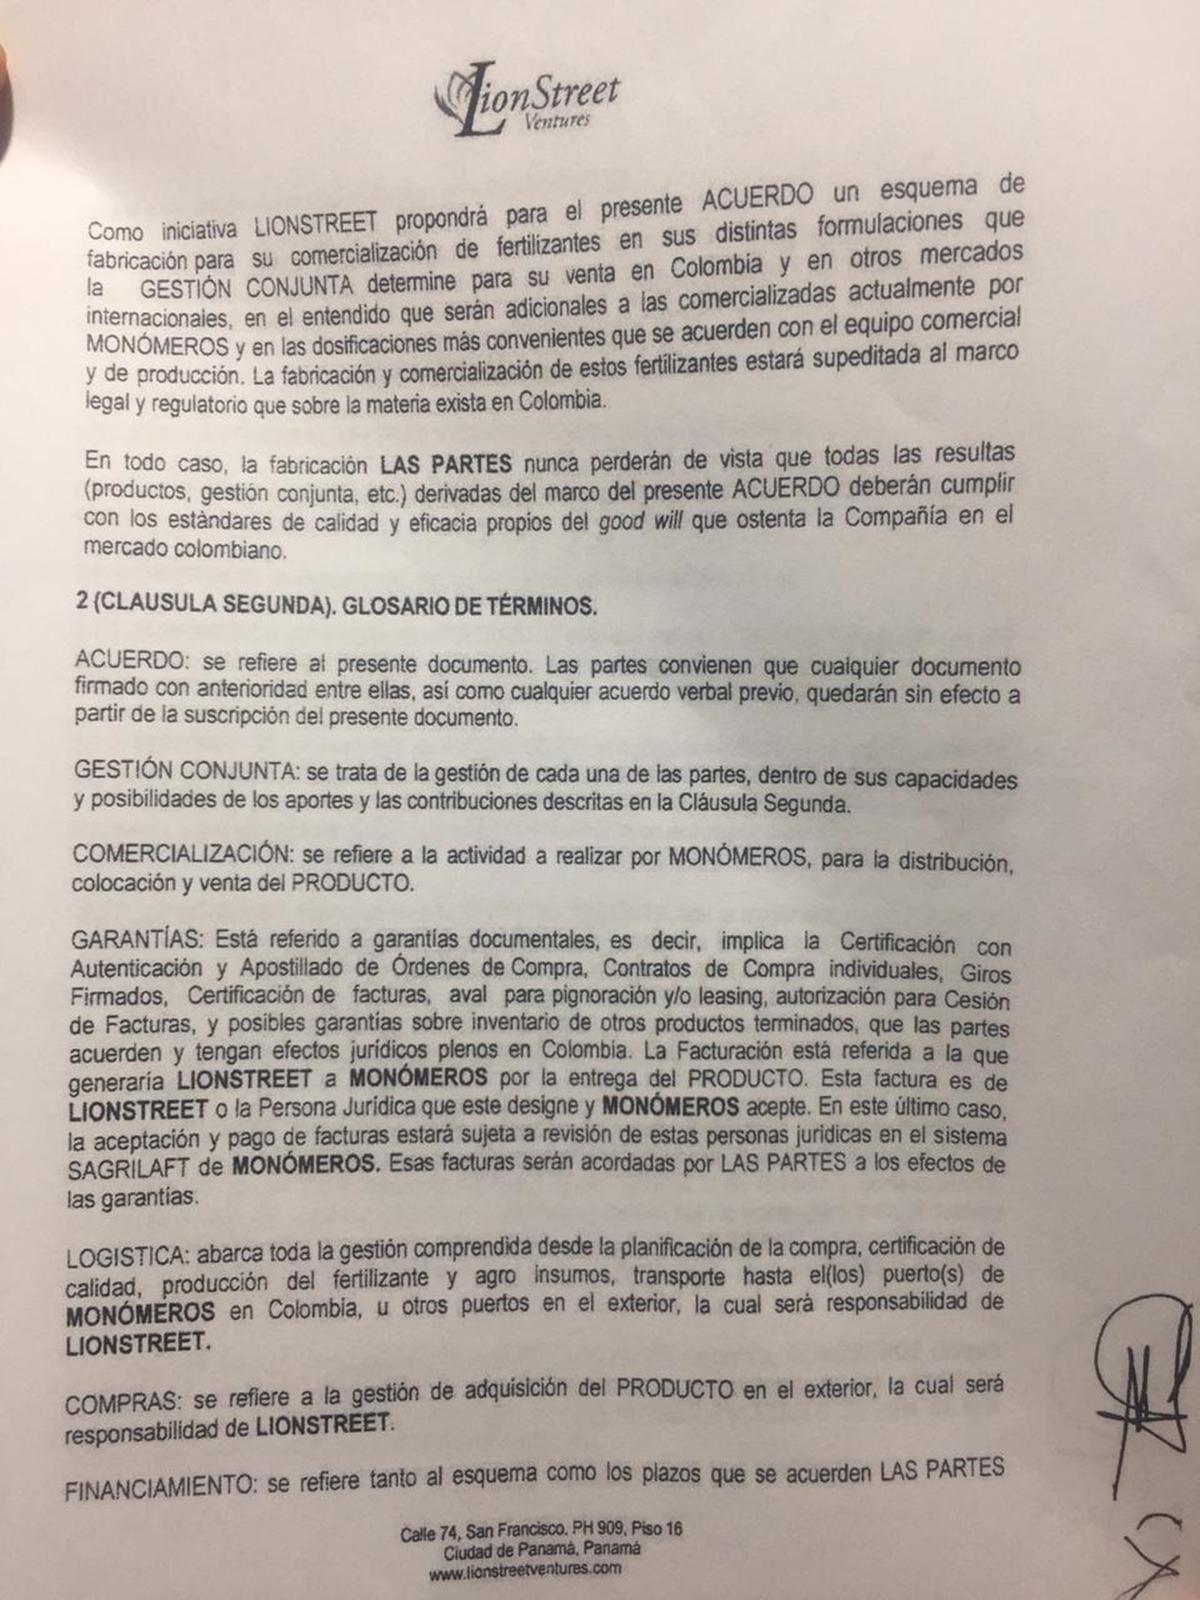 https://cdn.elnacional.com/wp-content/uploads/2021/07/Acuerdo-monomeros-2.jpeg